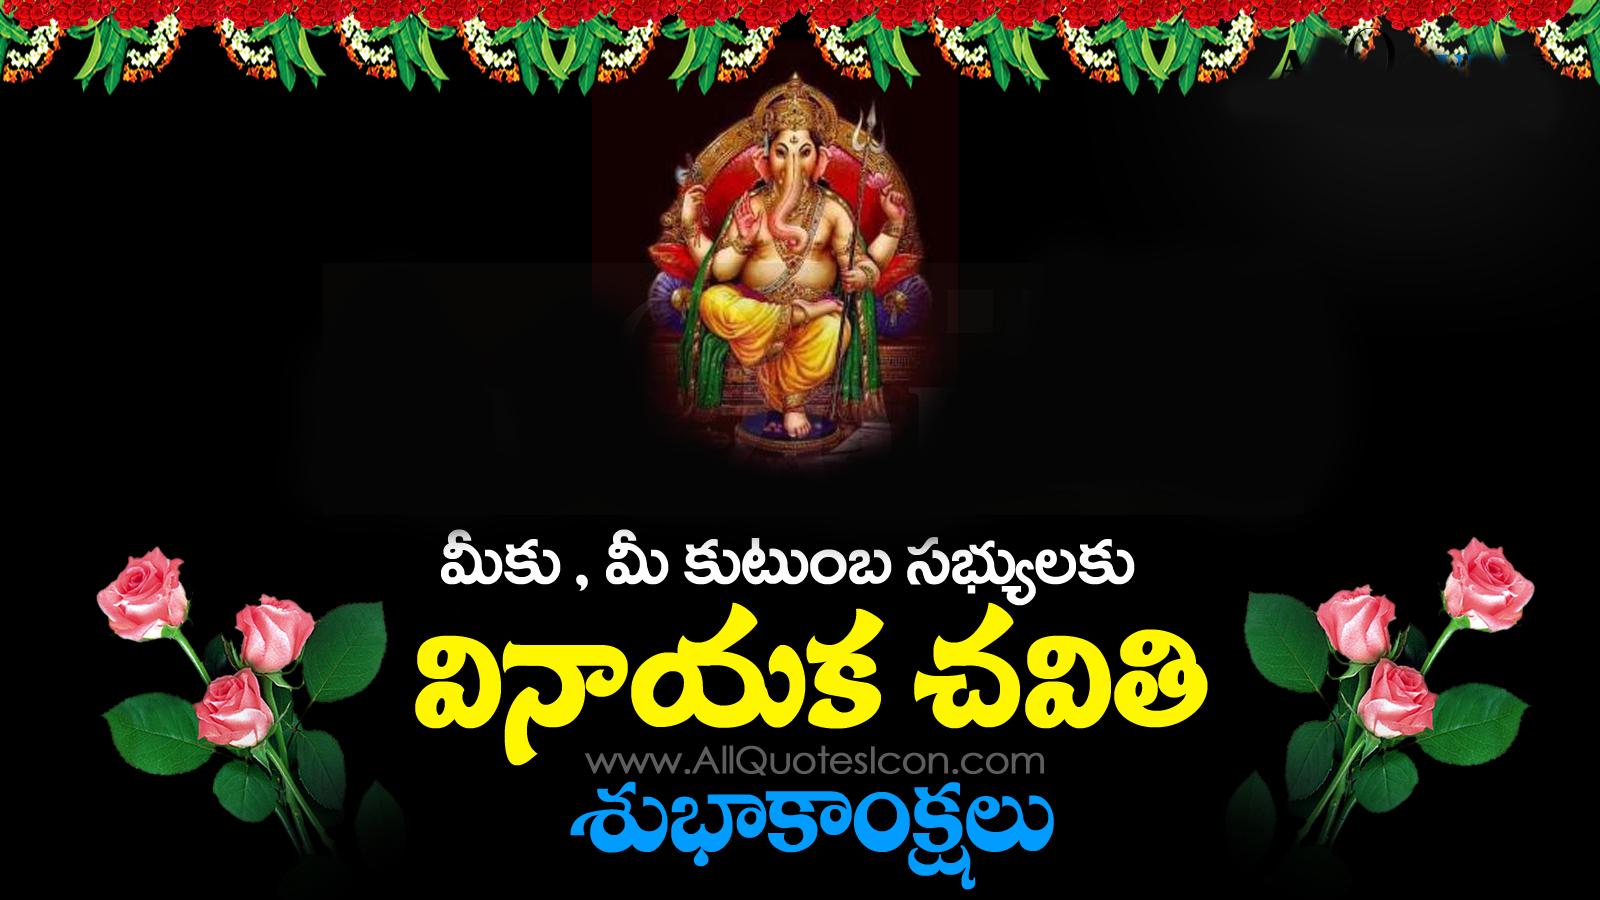 Vinayaka Chavithi Greeting Cards And Wallpapers Jaitelugutalli